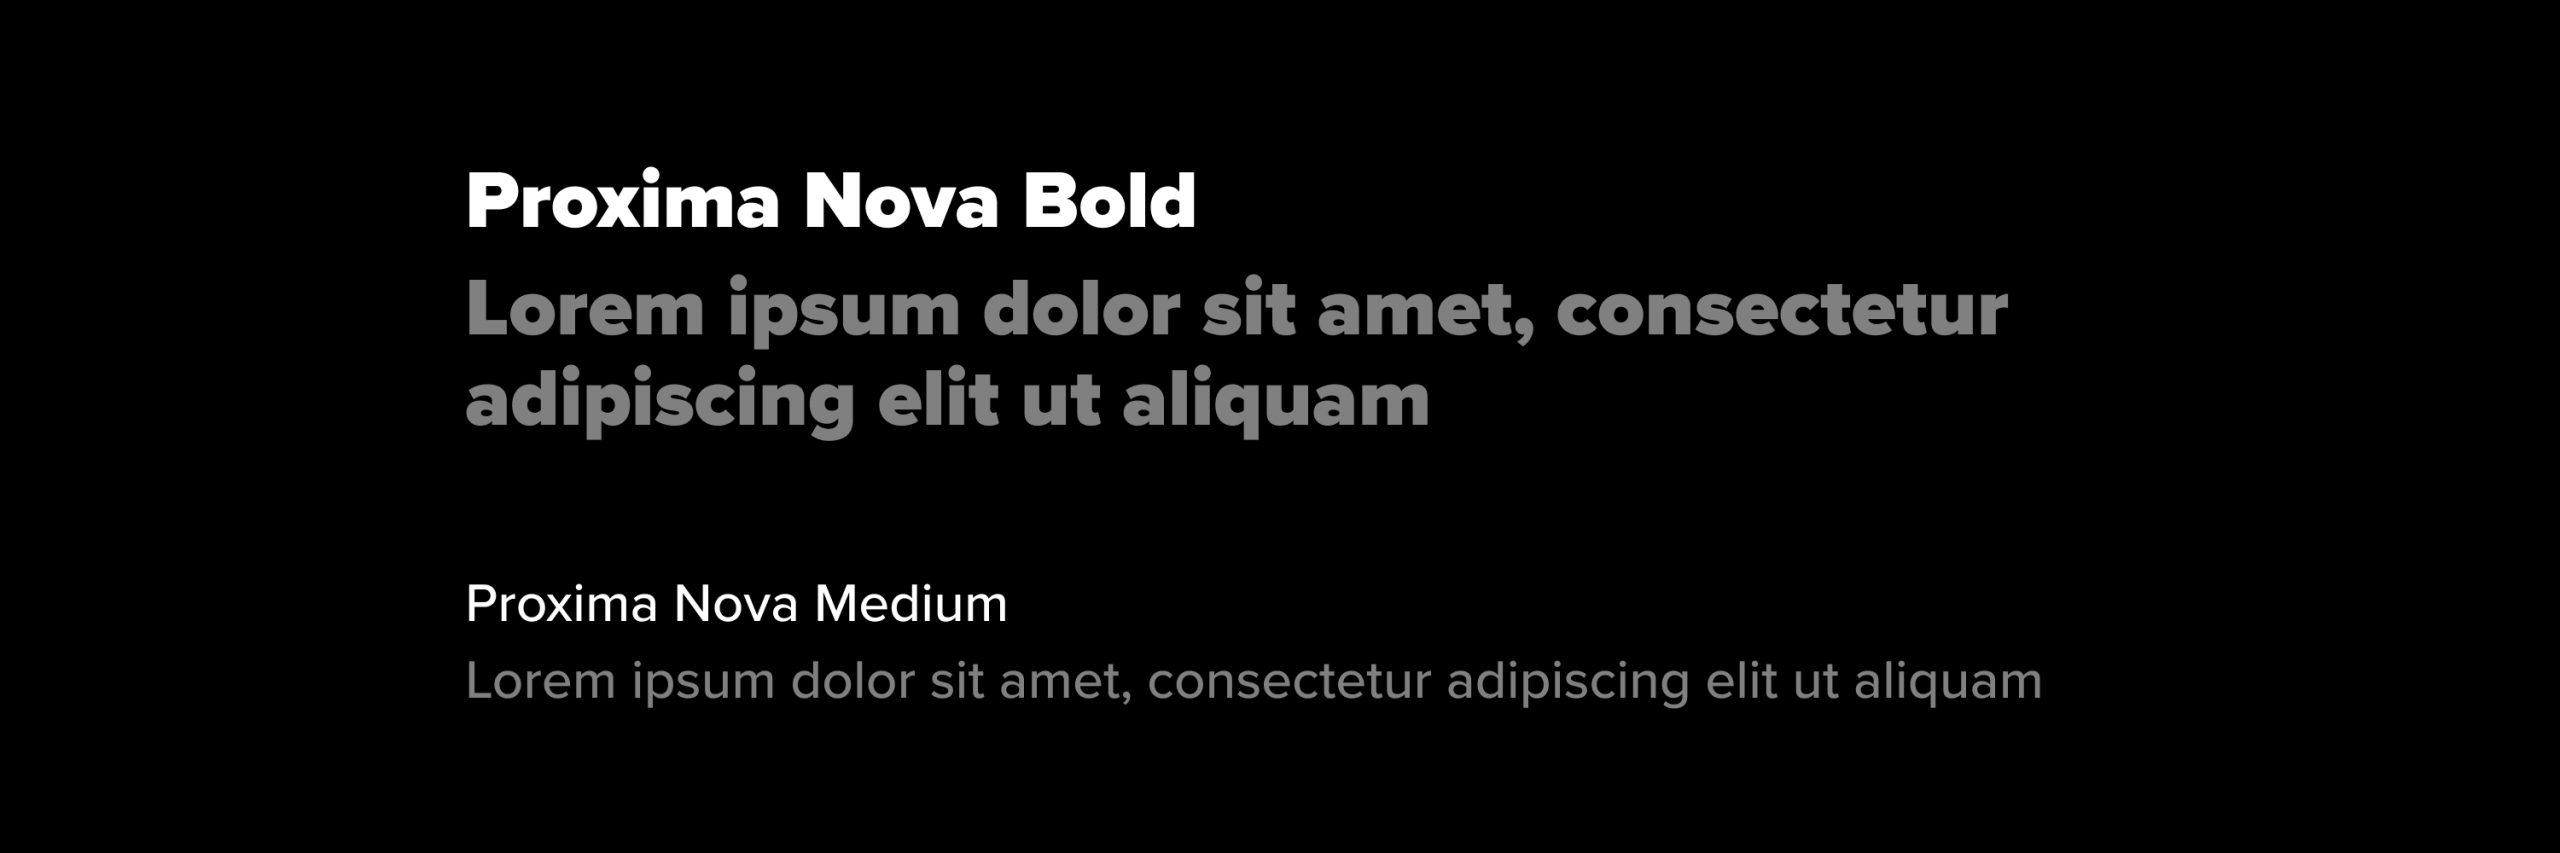 Compass-typography